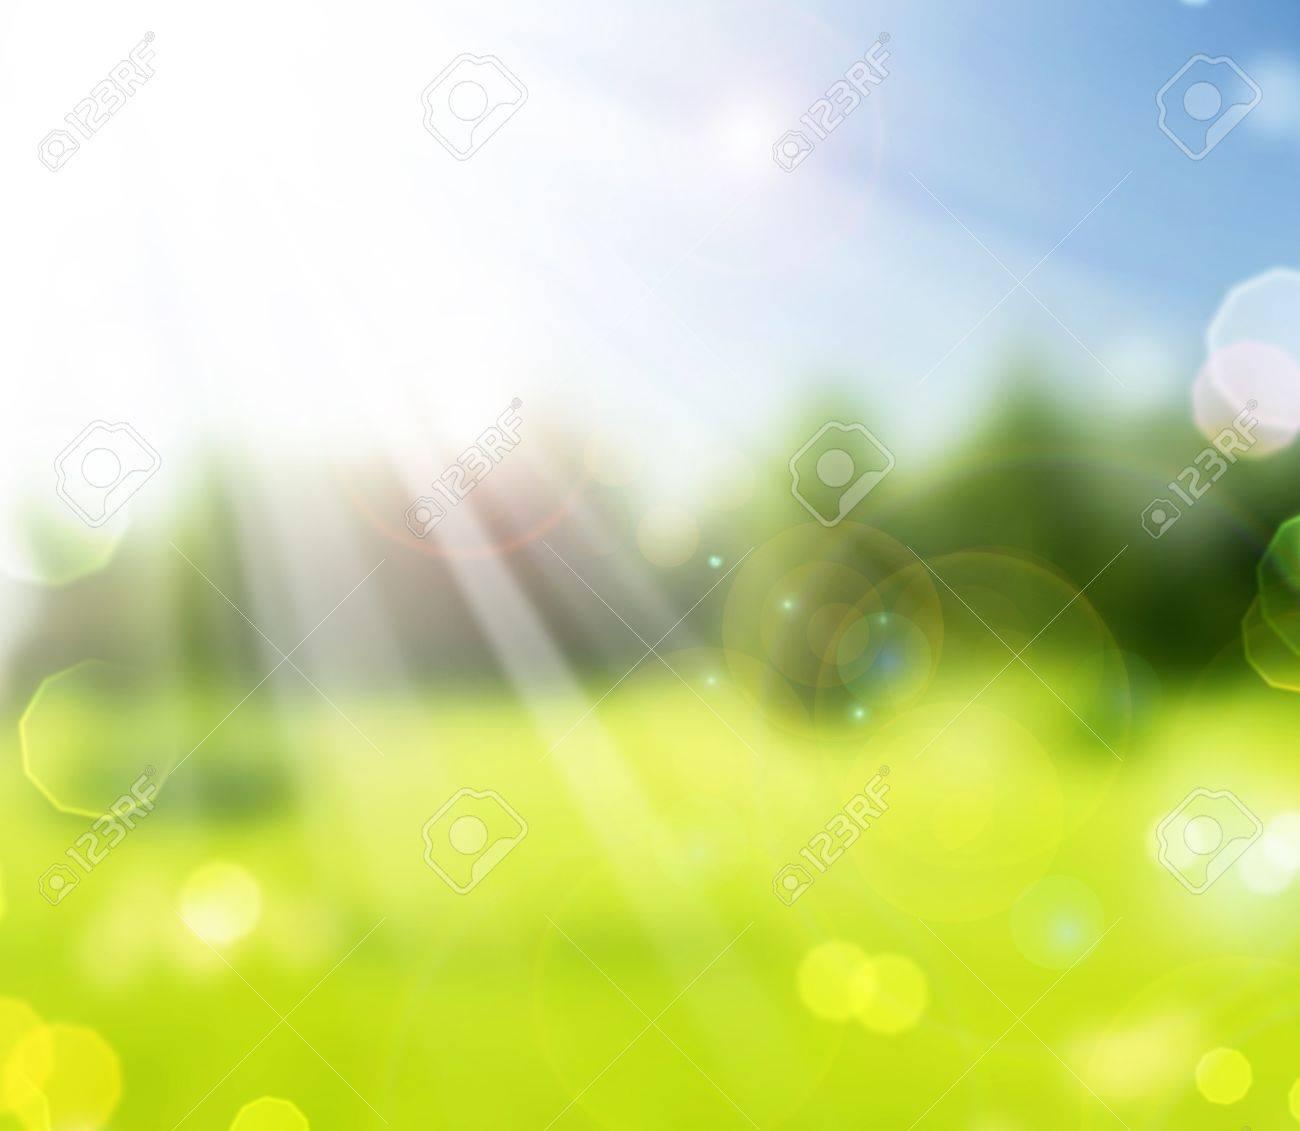 Beautiful Nature Spring Bokeh.Blurred Sunny background Stock Photo - 9202577